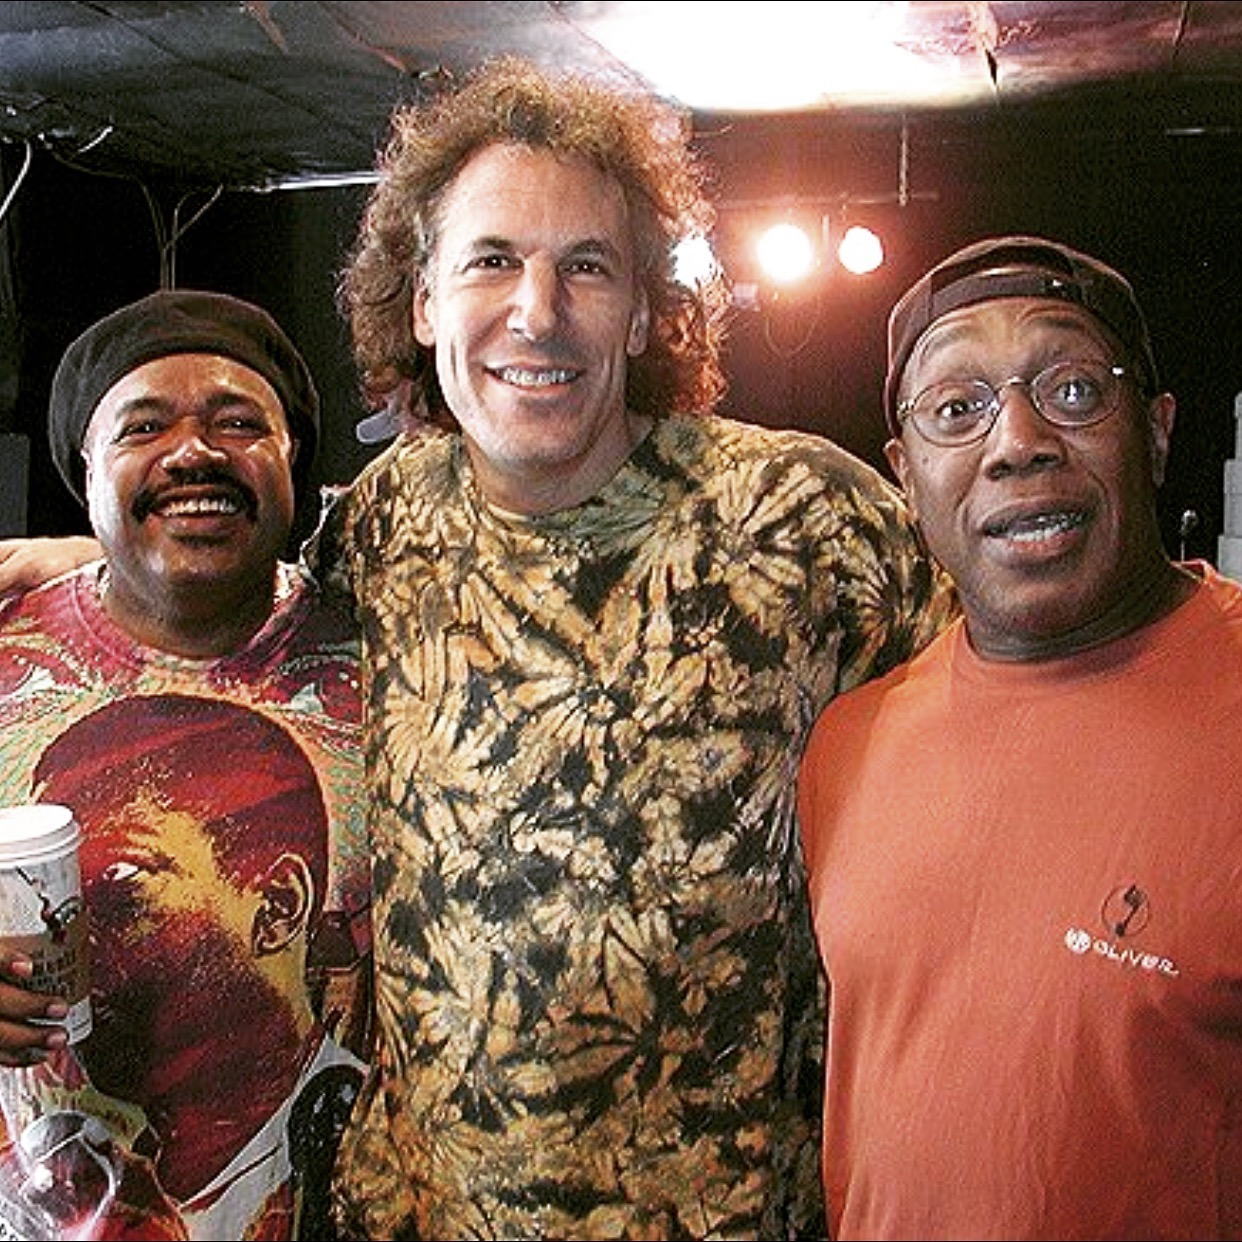 Dennis Chambers, JP & Billy Cobham